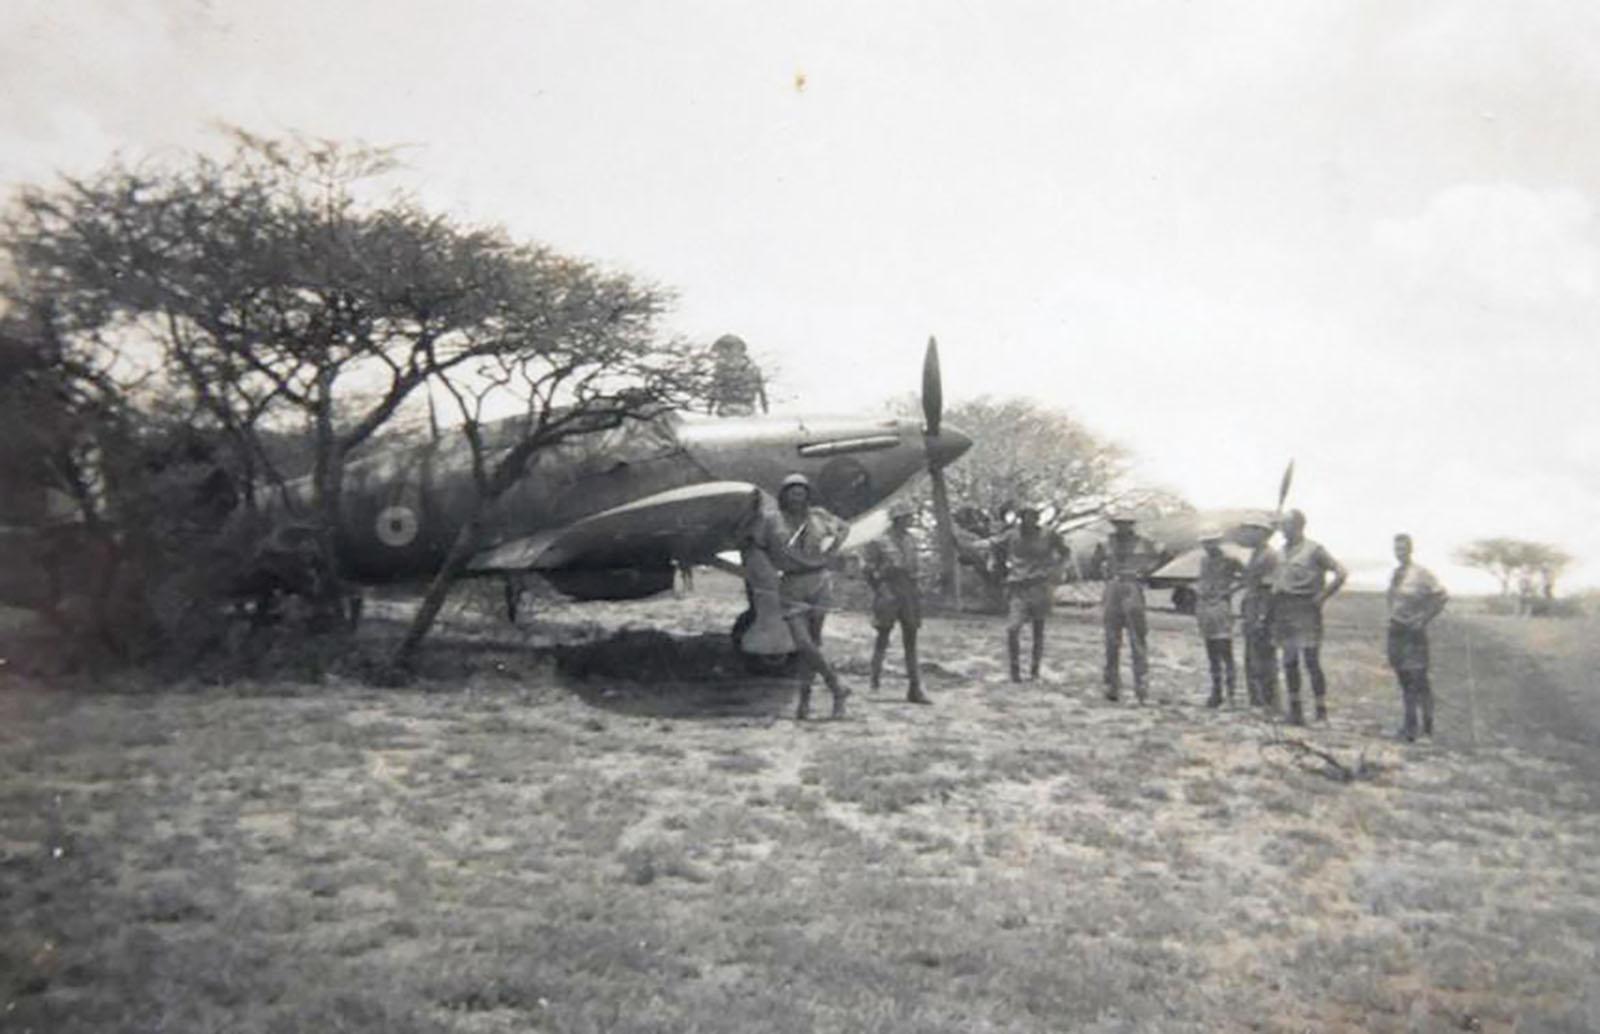 Hurricane I Trop SAAF 3Sqn aircraft East Africa March 1941 01